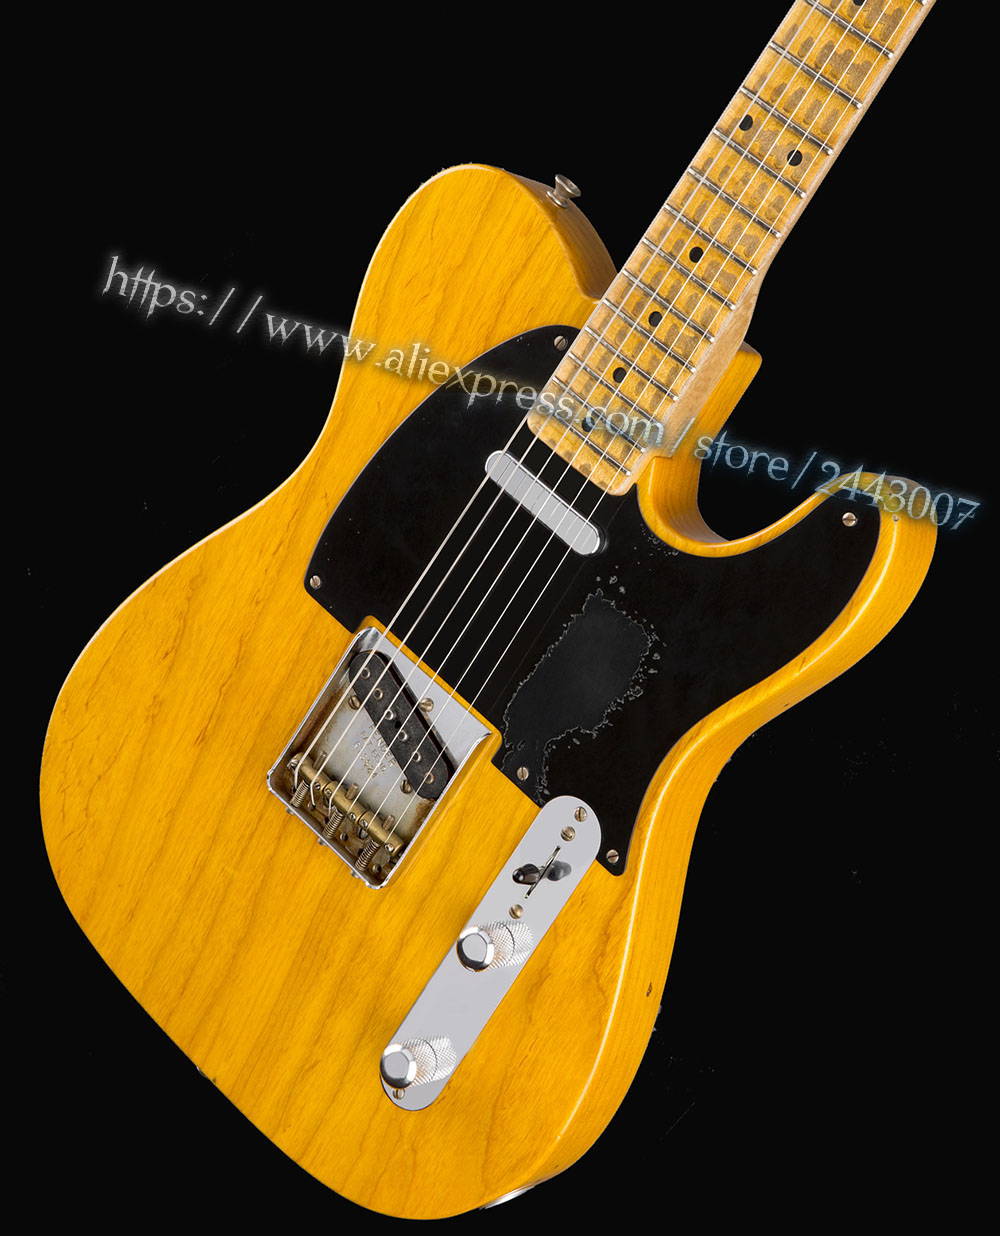 GC Custom Shop Mike Campbell Heartbreaker Ltd butterscotch blonde eléctrico Guitarras